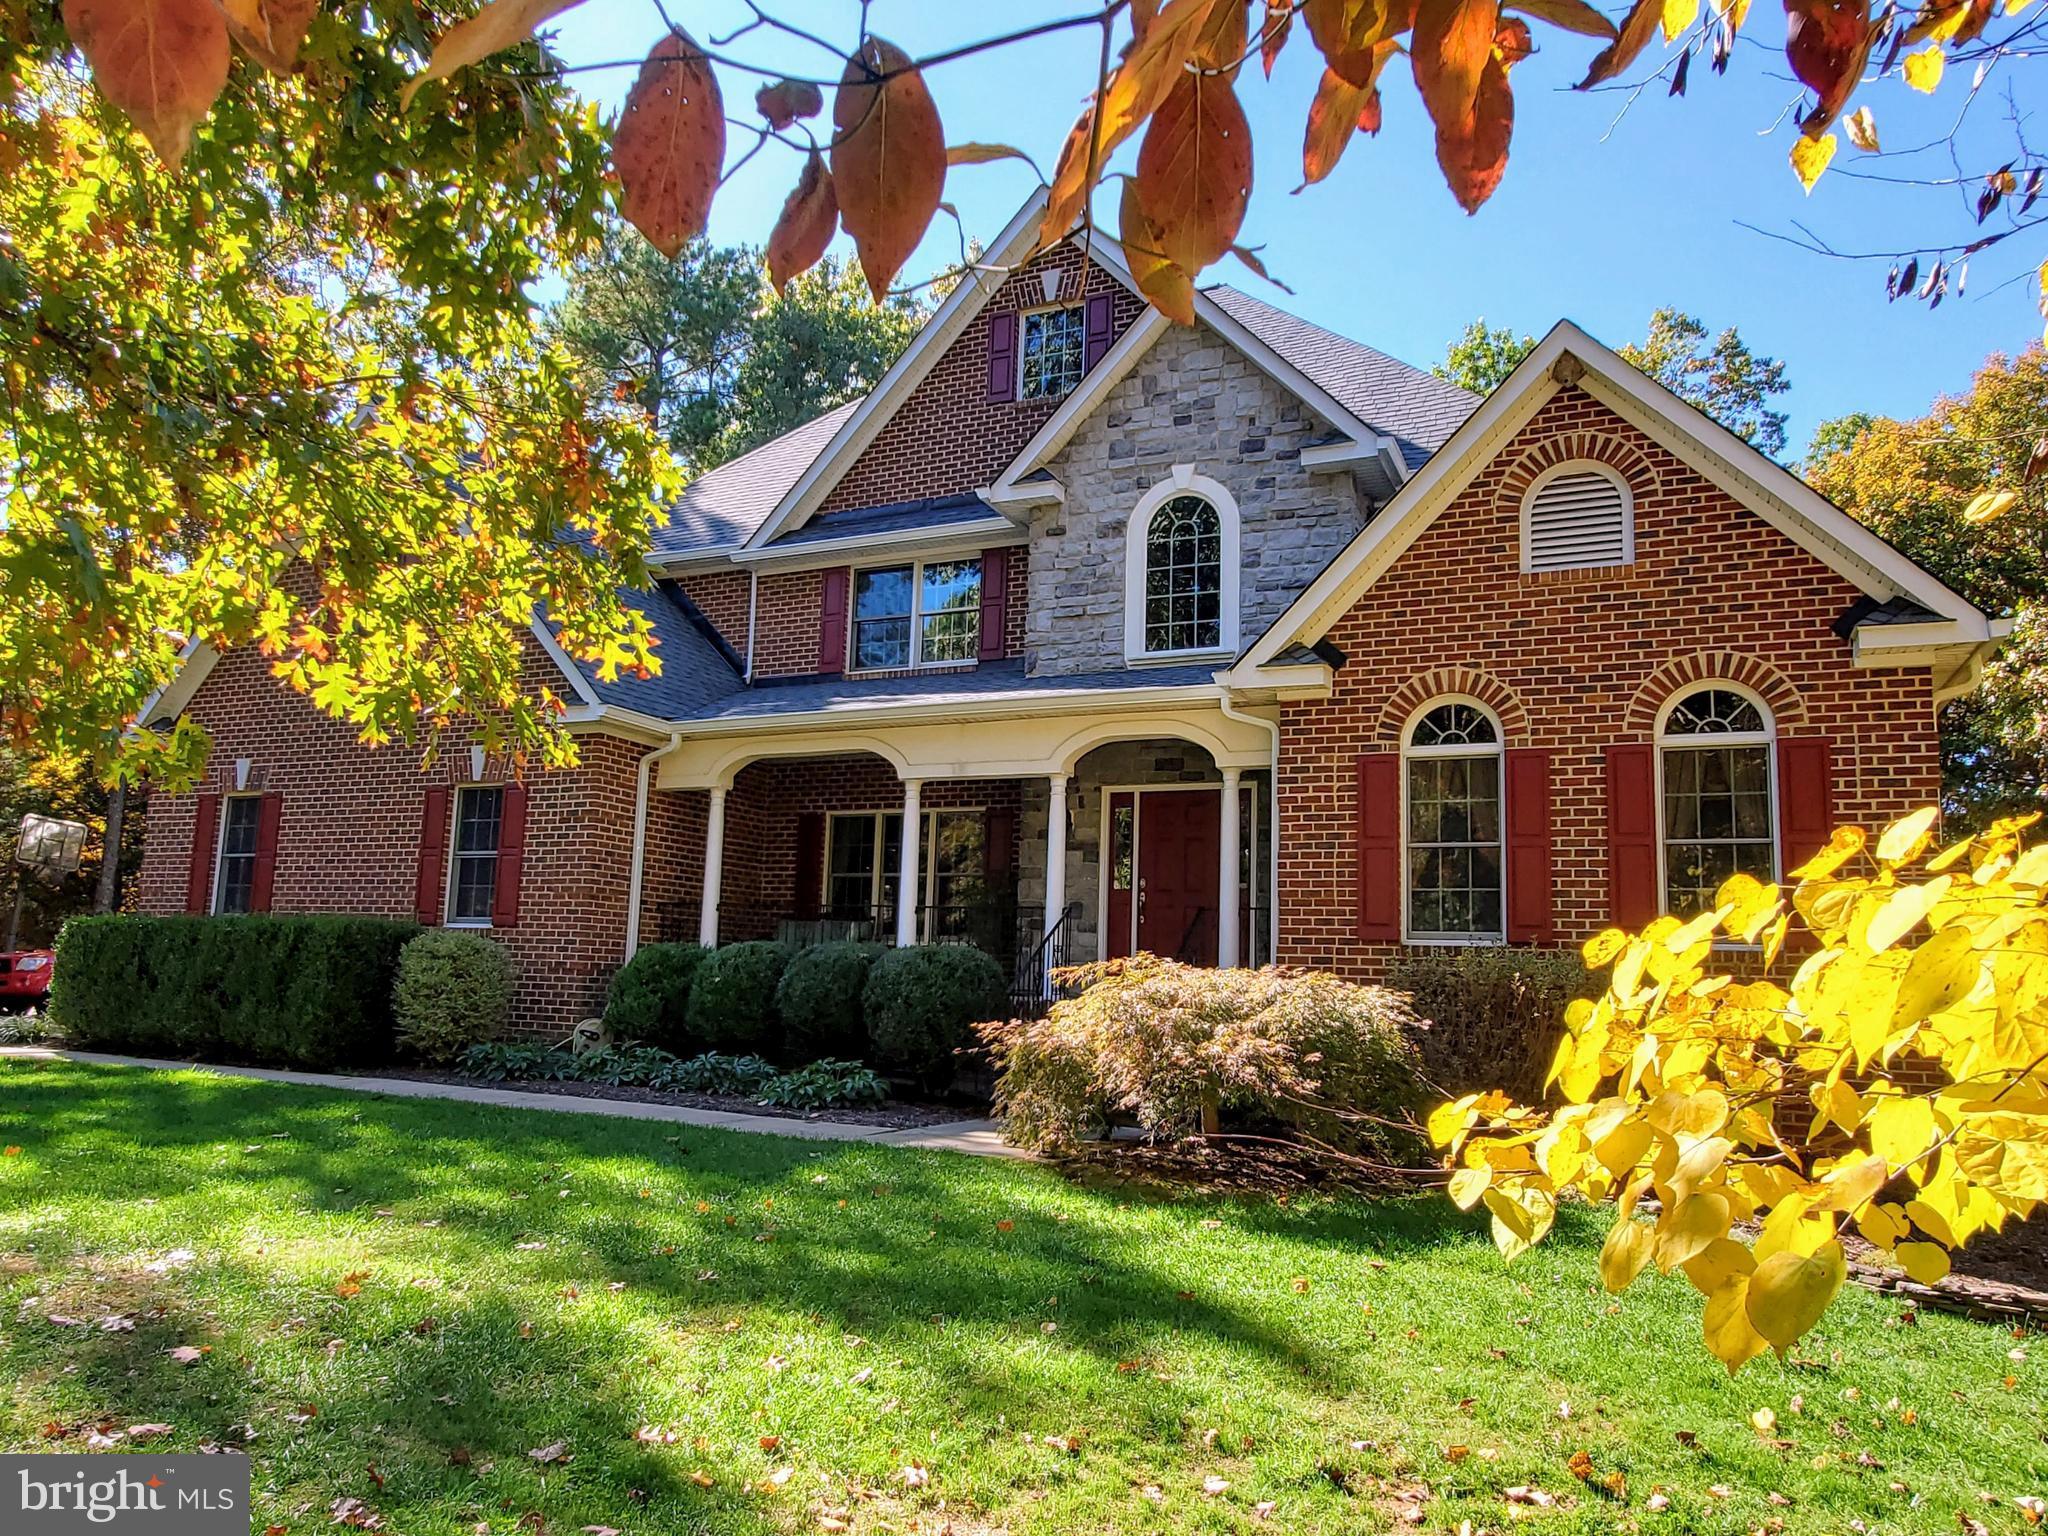 11610 Stonewall Jackson Drive, Spotsylvania, VA 22551